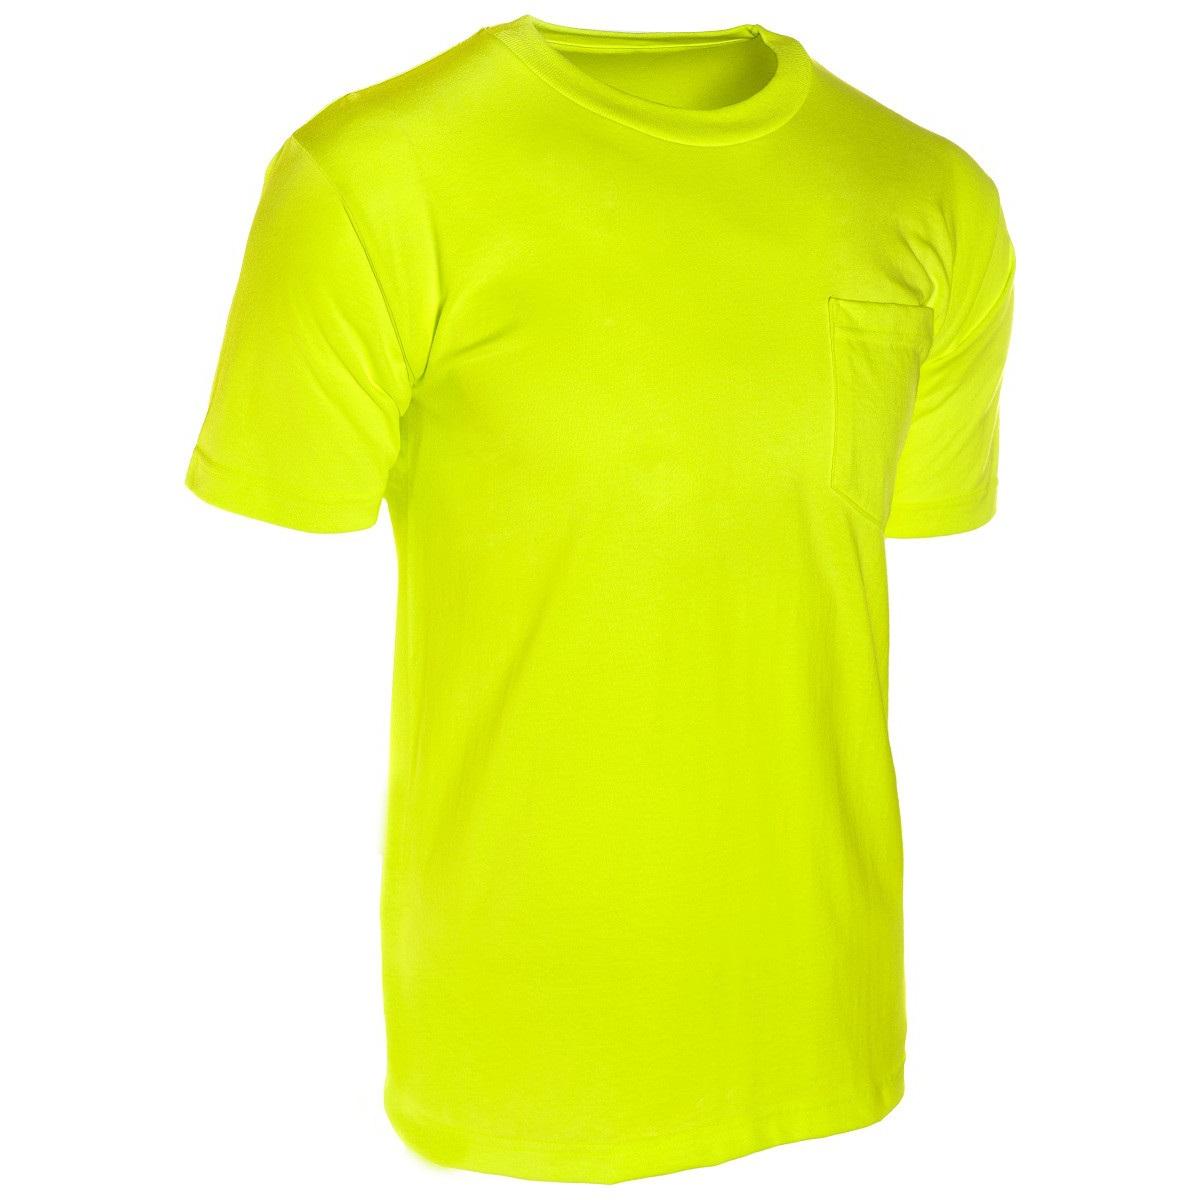 ML Kishigo 9124 Microfiber Short Sleeve T-Shirt - Yellow ...